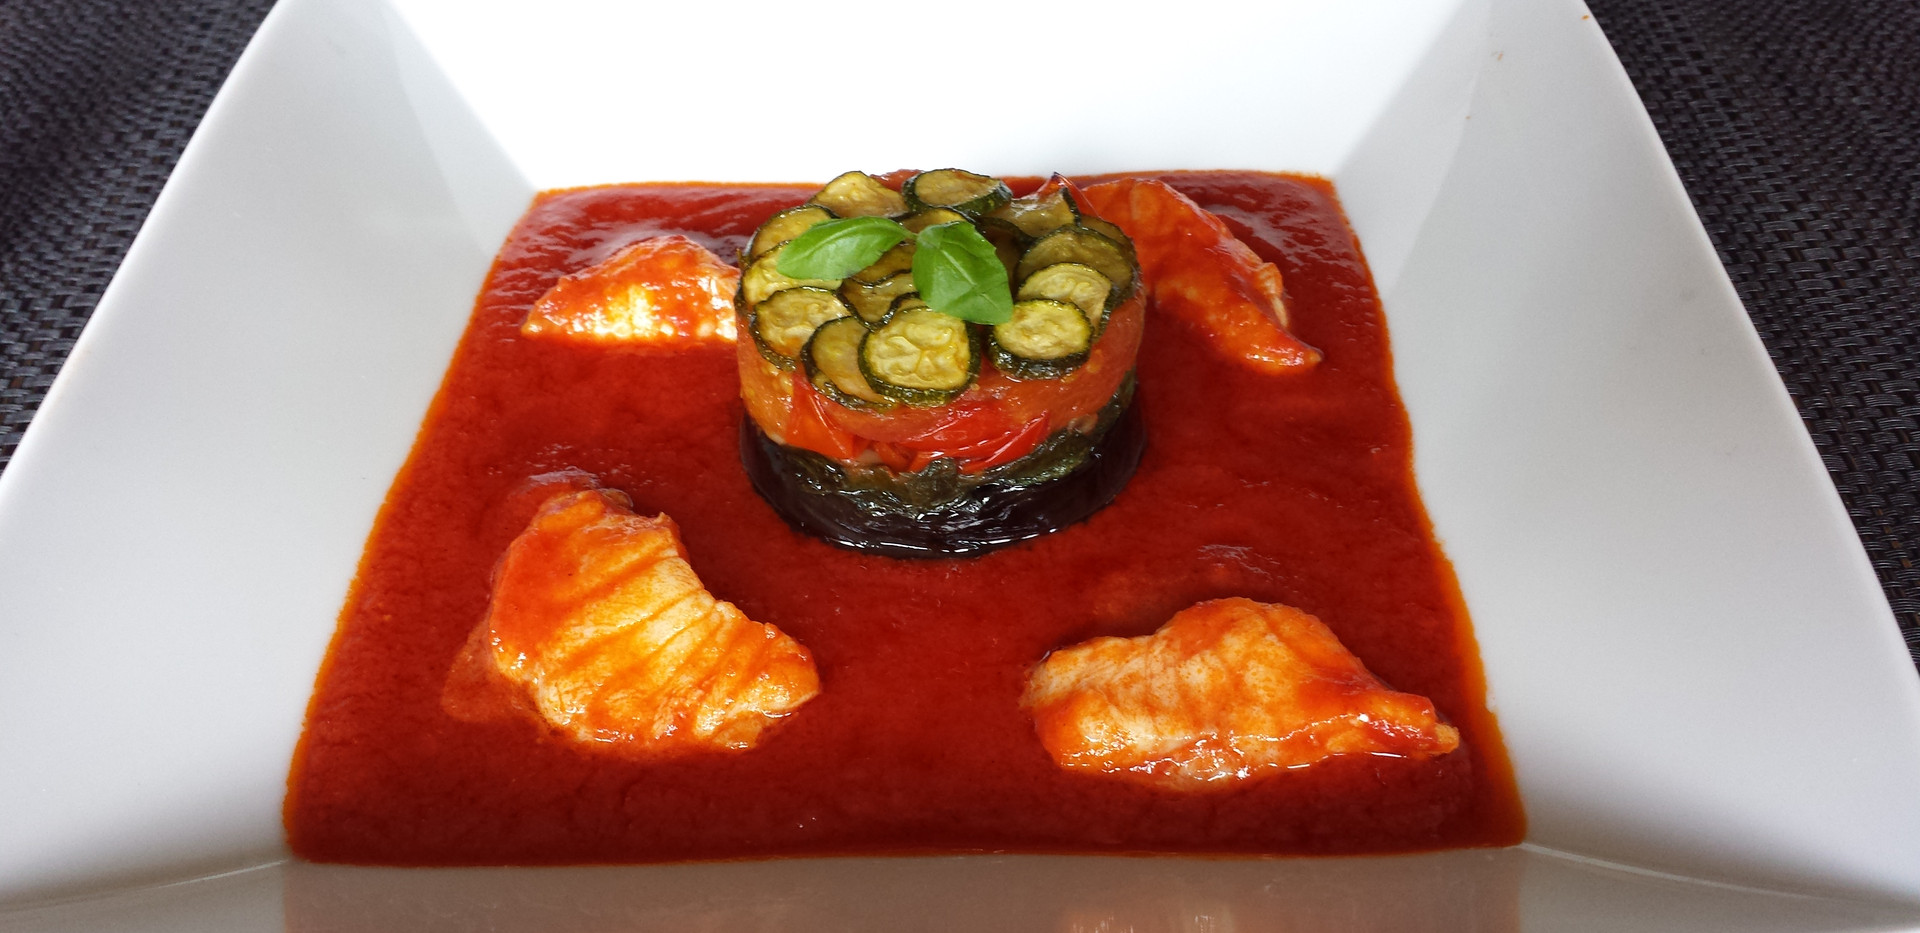 Aubergine Gateau with Monkfish in Fresh Tomato Sauce